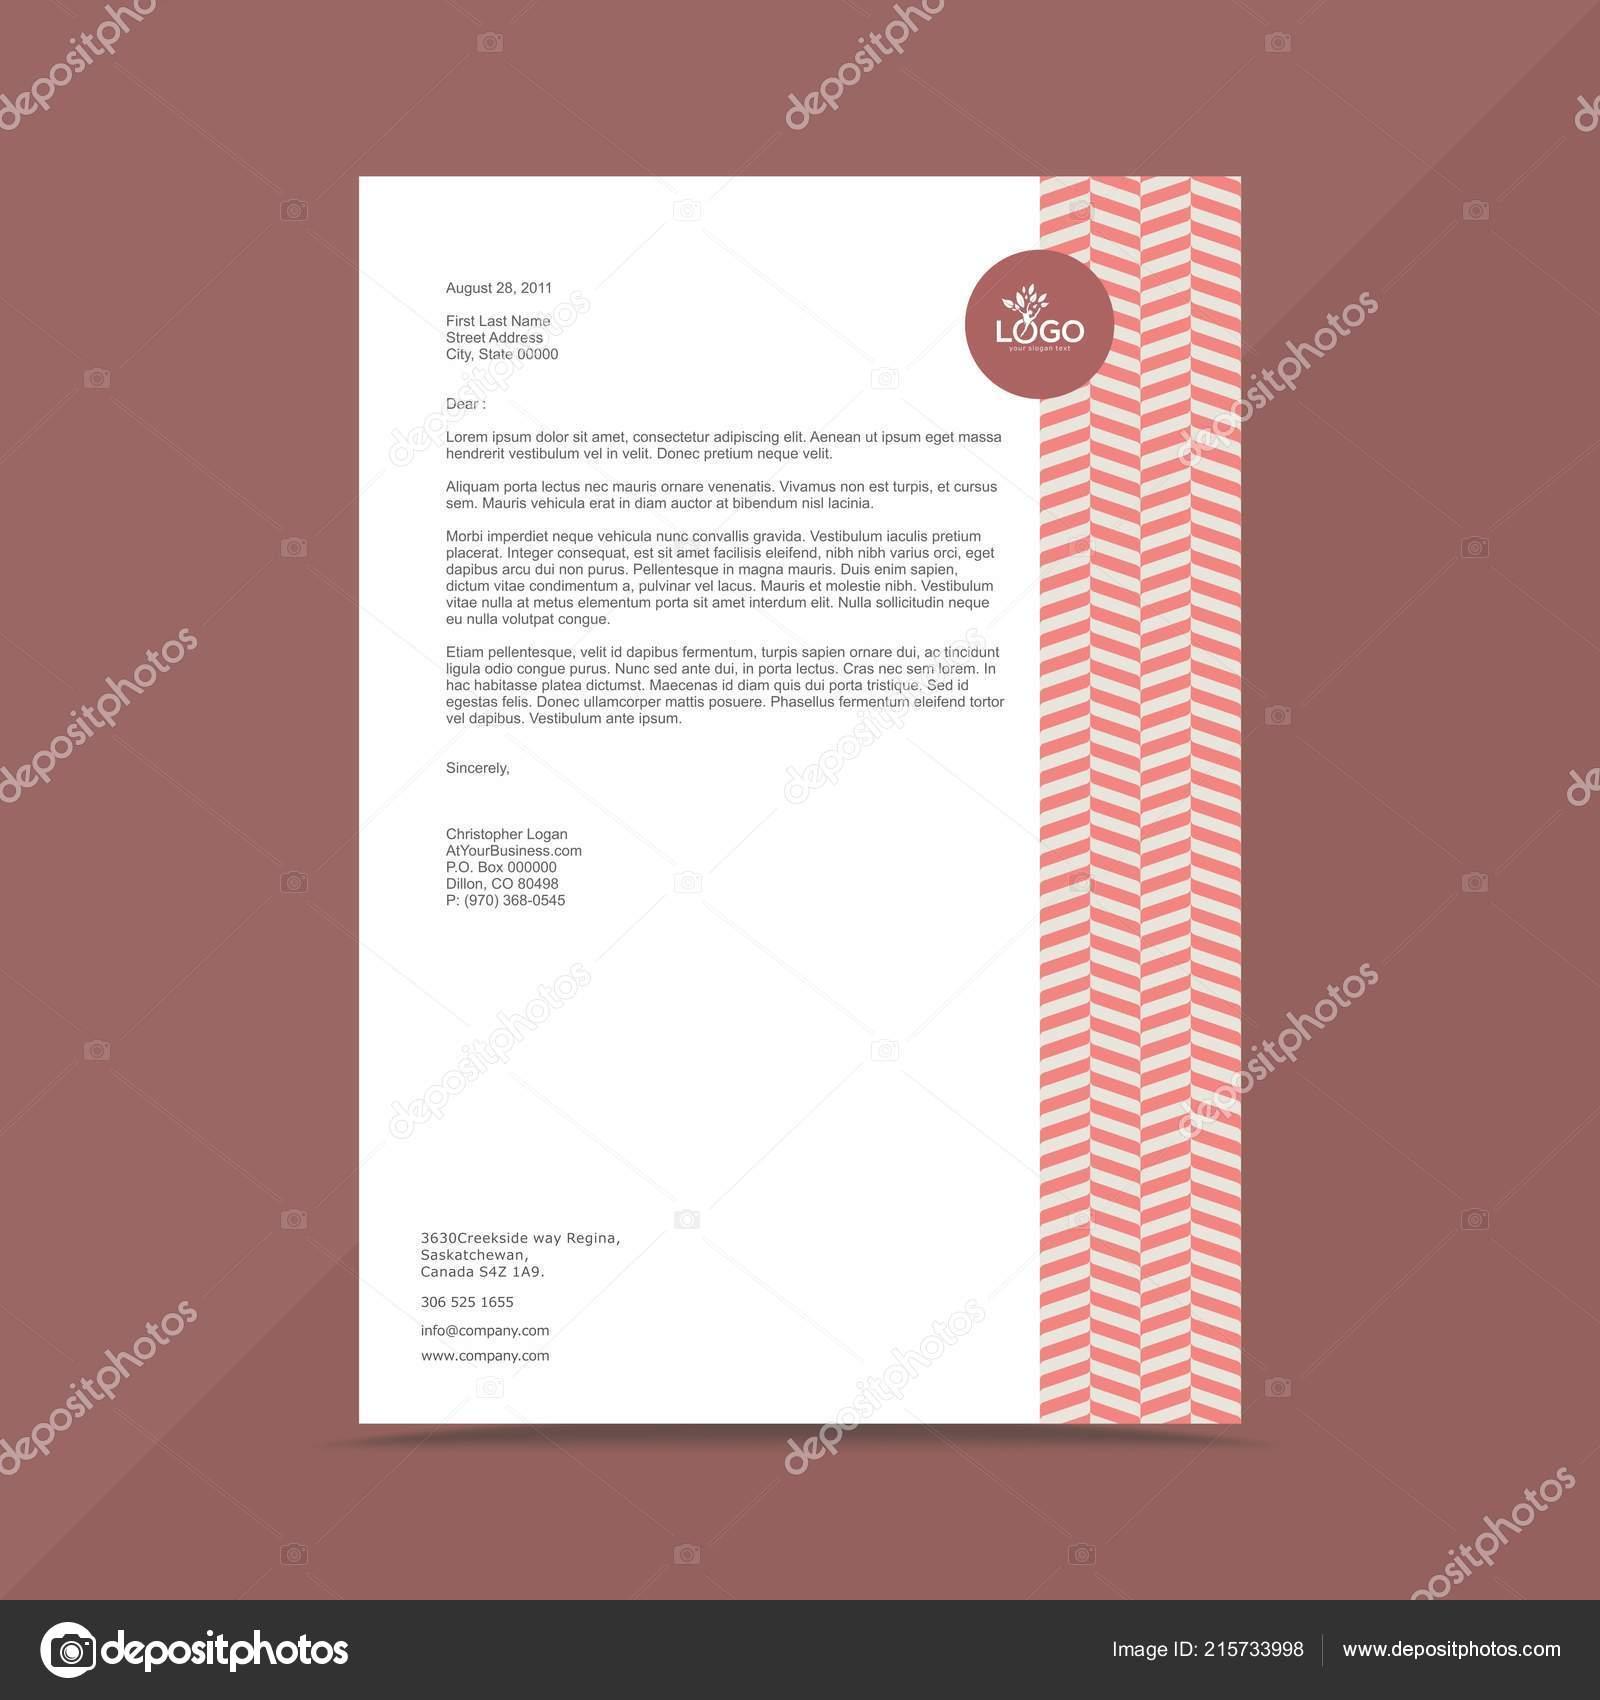 Professional business letterhead design template stock vector professional business letterhead design template stock vector friedricerecipe Choice Image